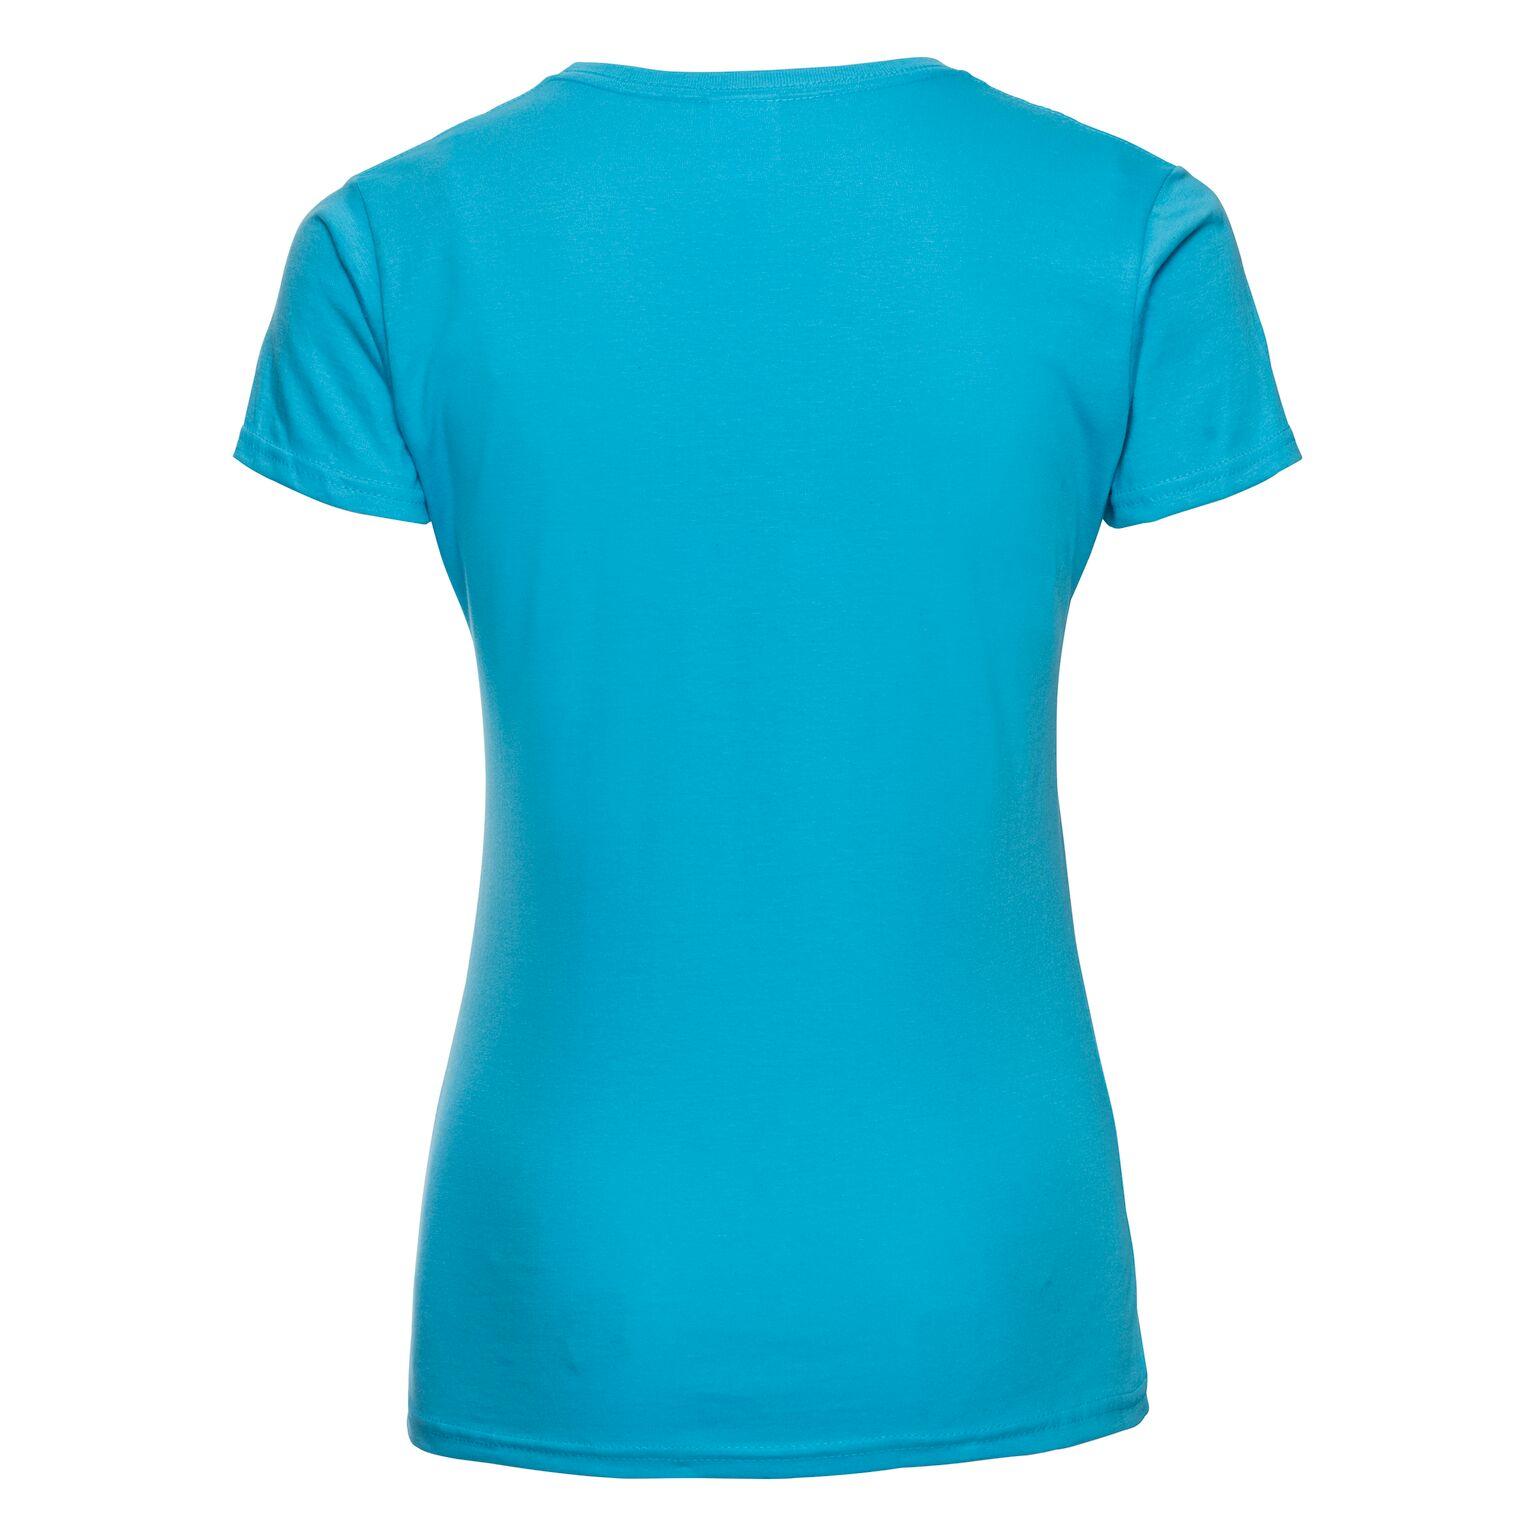 05_j155f_turquoise--0-0--0f0876e1-0f3e-43e1-b6a3-8693ec0d97ee